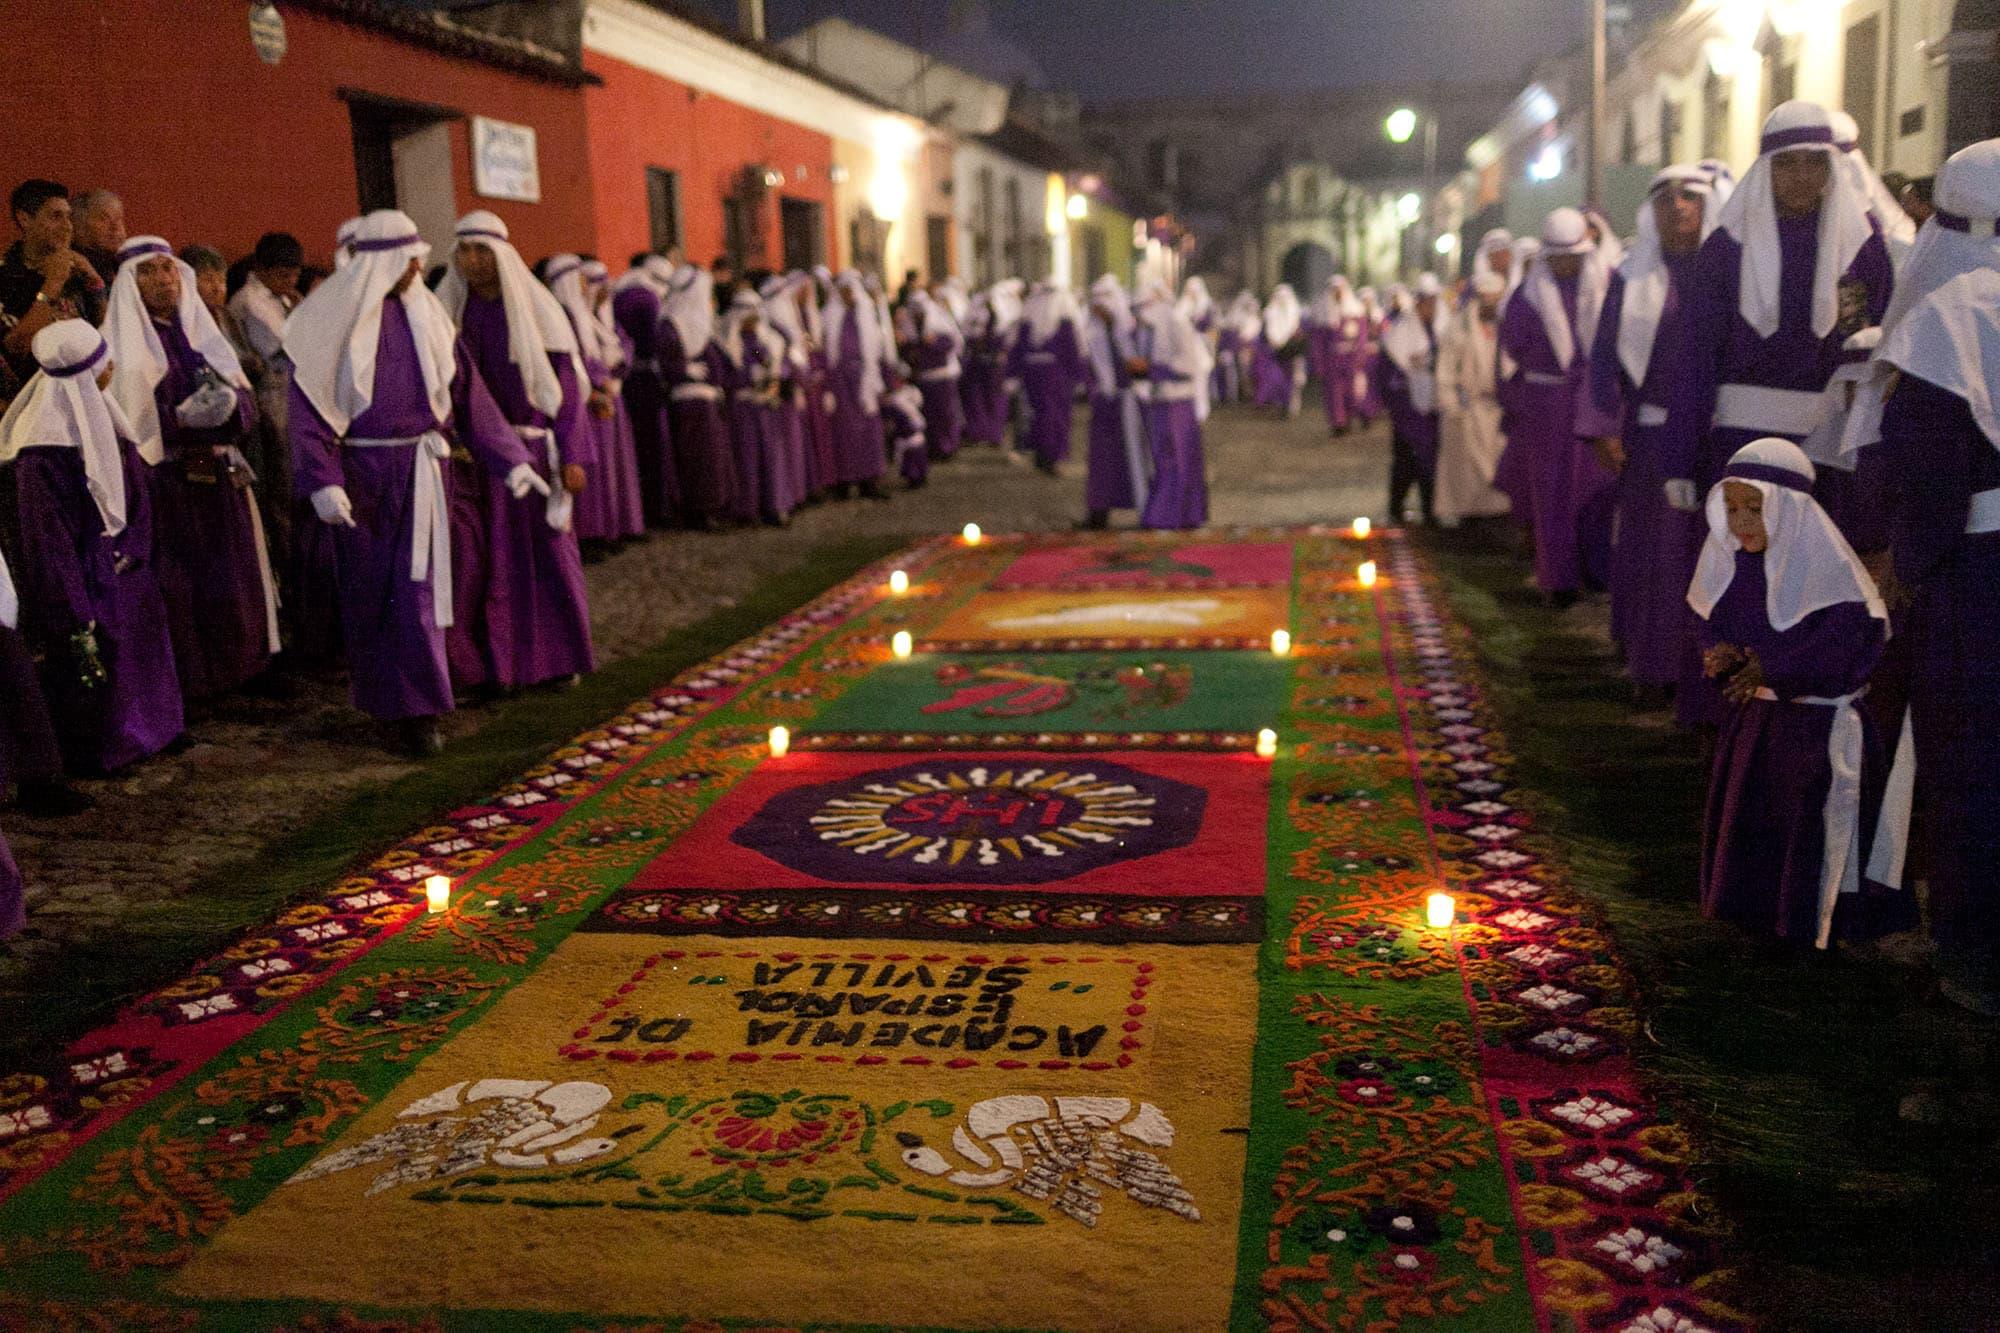 Alfombra sawdust carpet at a procession for Semana Santa in Antigua, Guatemala.